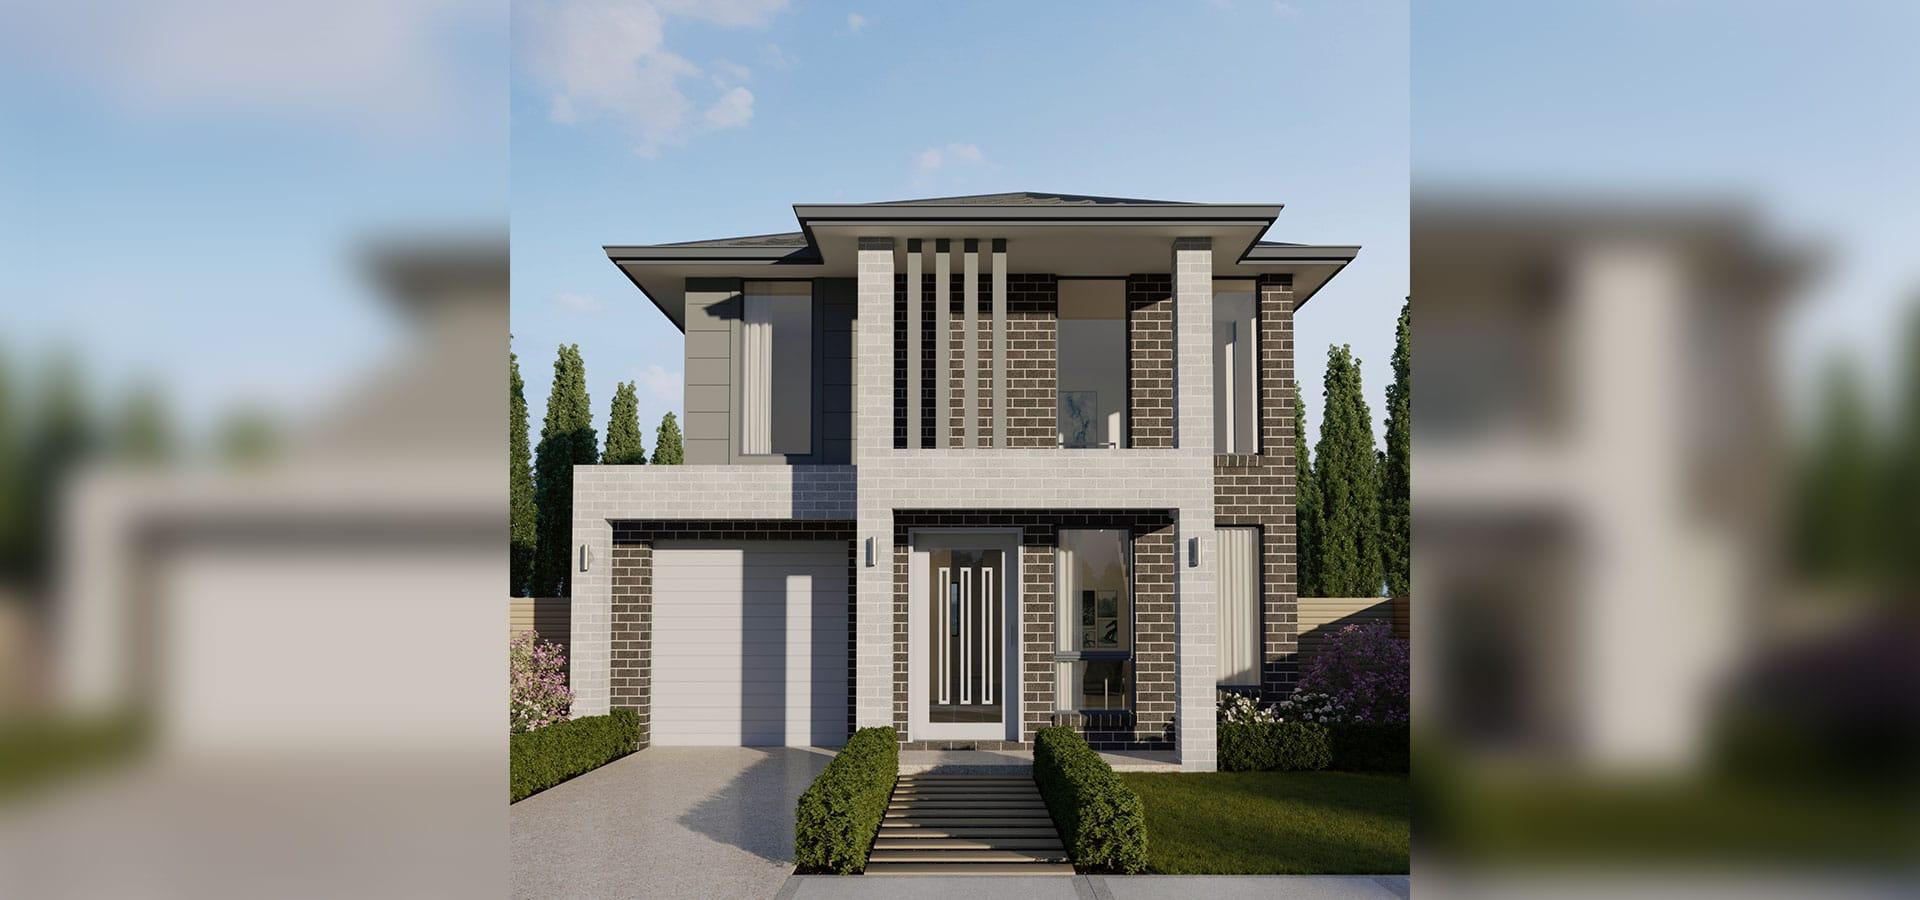 Bellflower-Double-House-Design updated